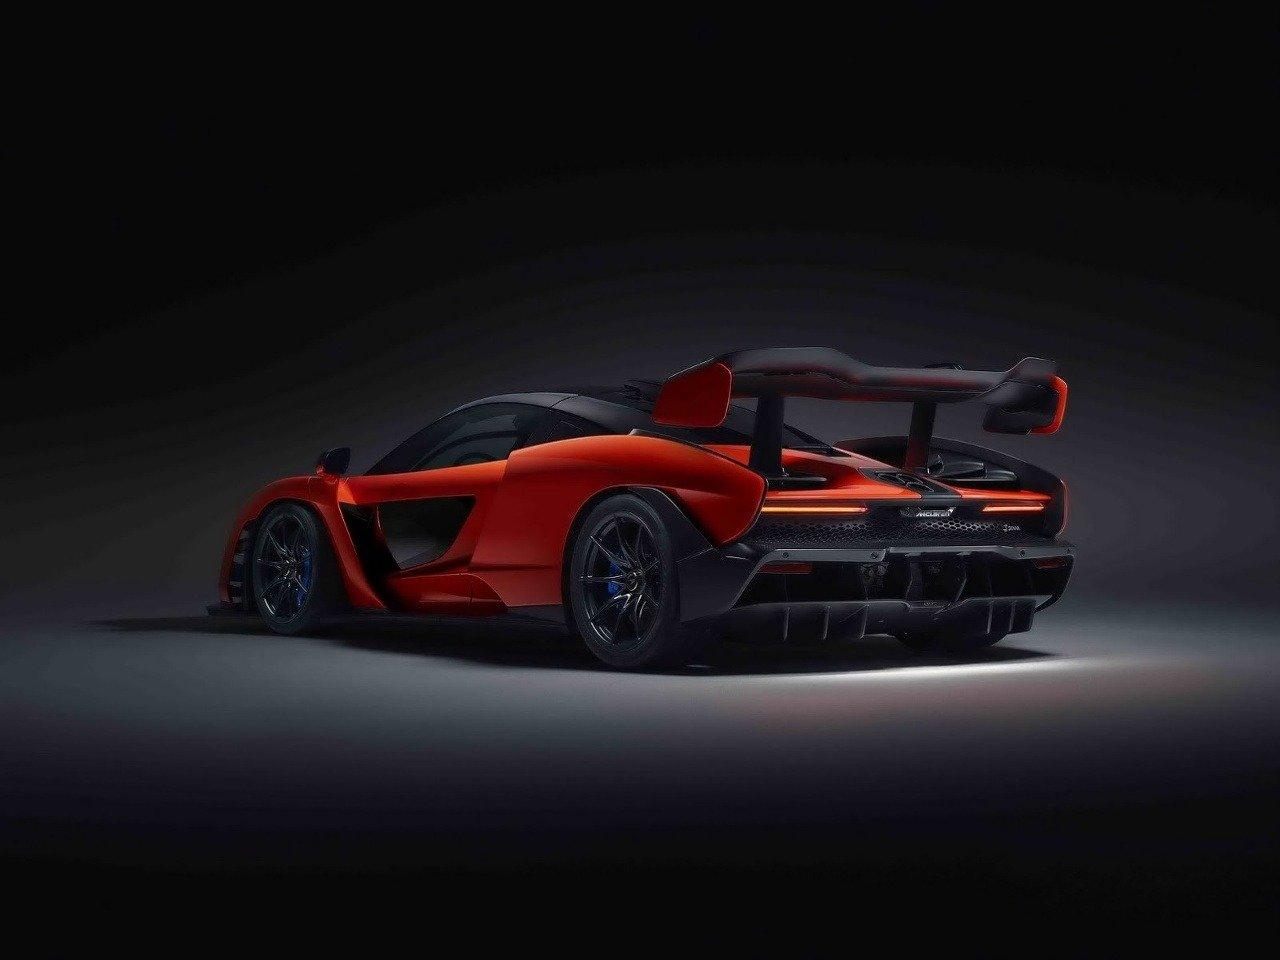 McLaren Senna hyperšport 2018